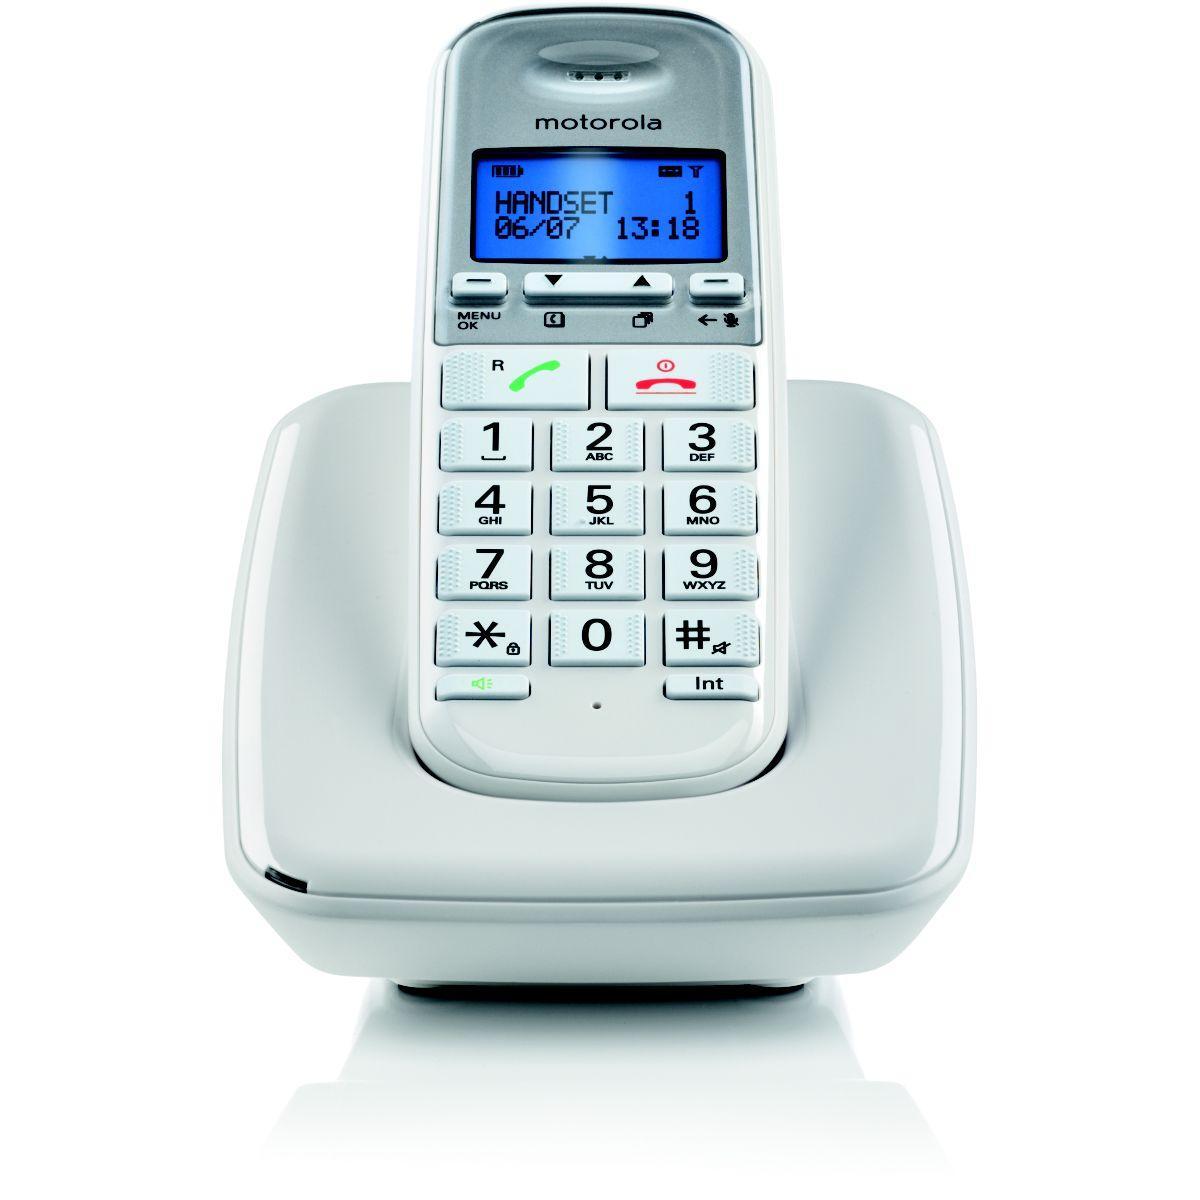 Téléphone motorola motorola s3001 blanc - 20% de remise immédiate avec le code : multi20 (photo)